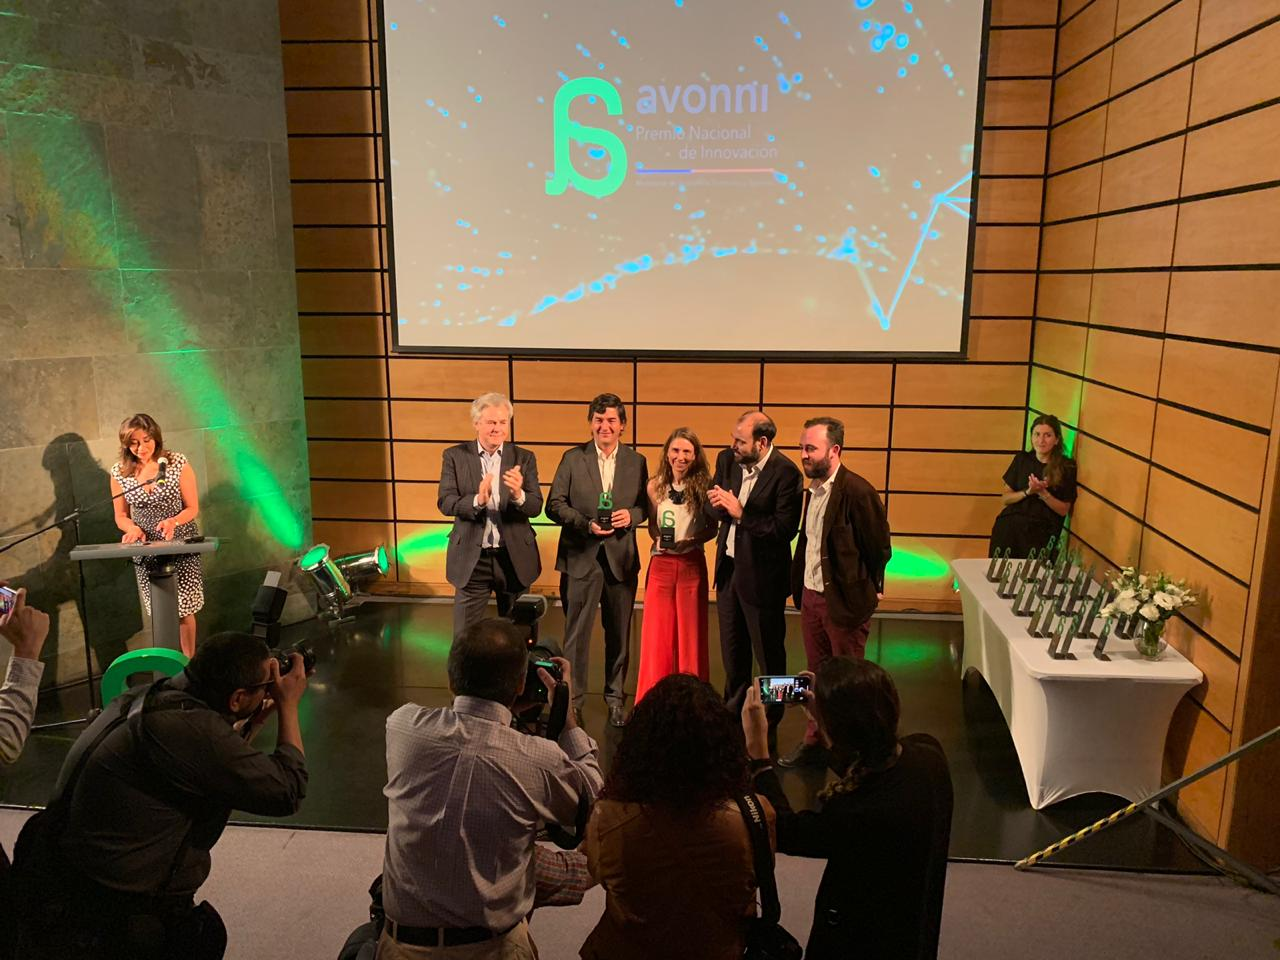 Aplicación EKID de Niños Primero gana premio Avonni - Diario Puerto Varas